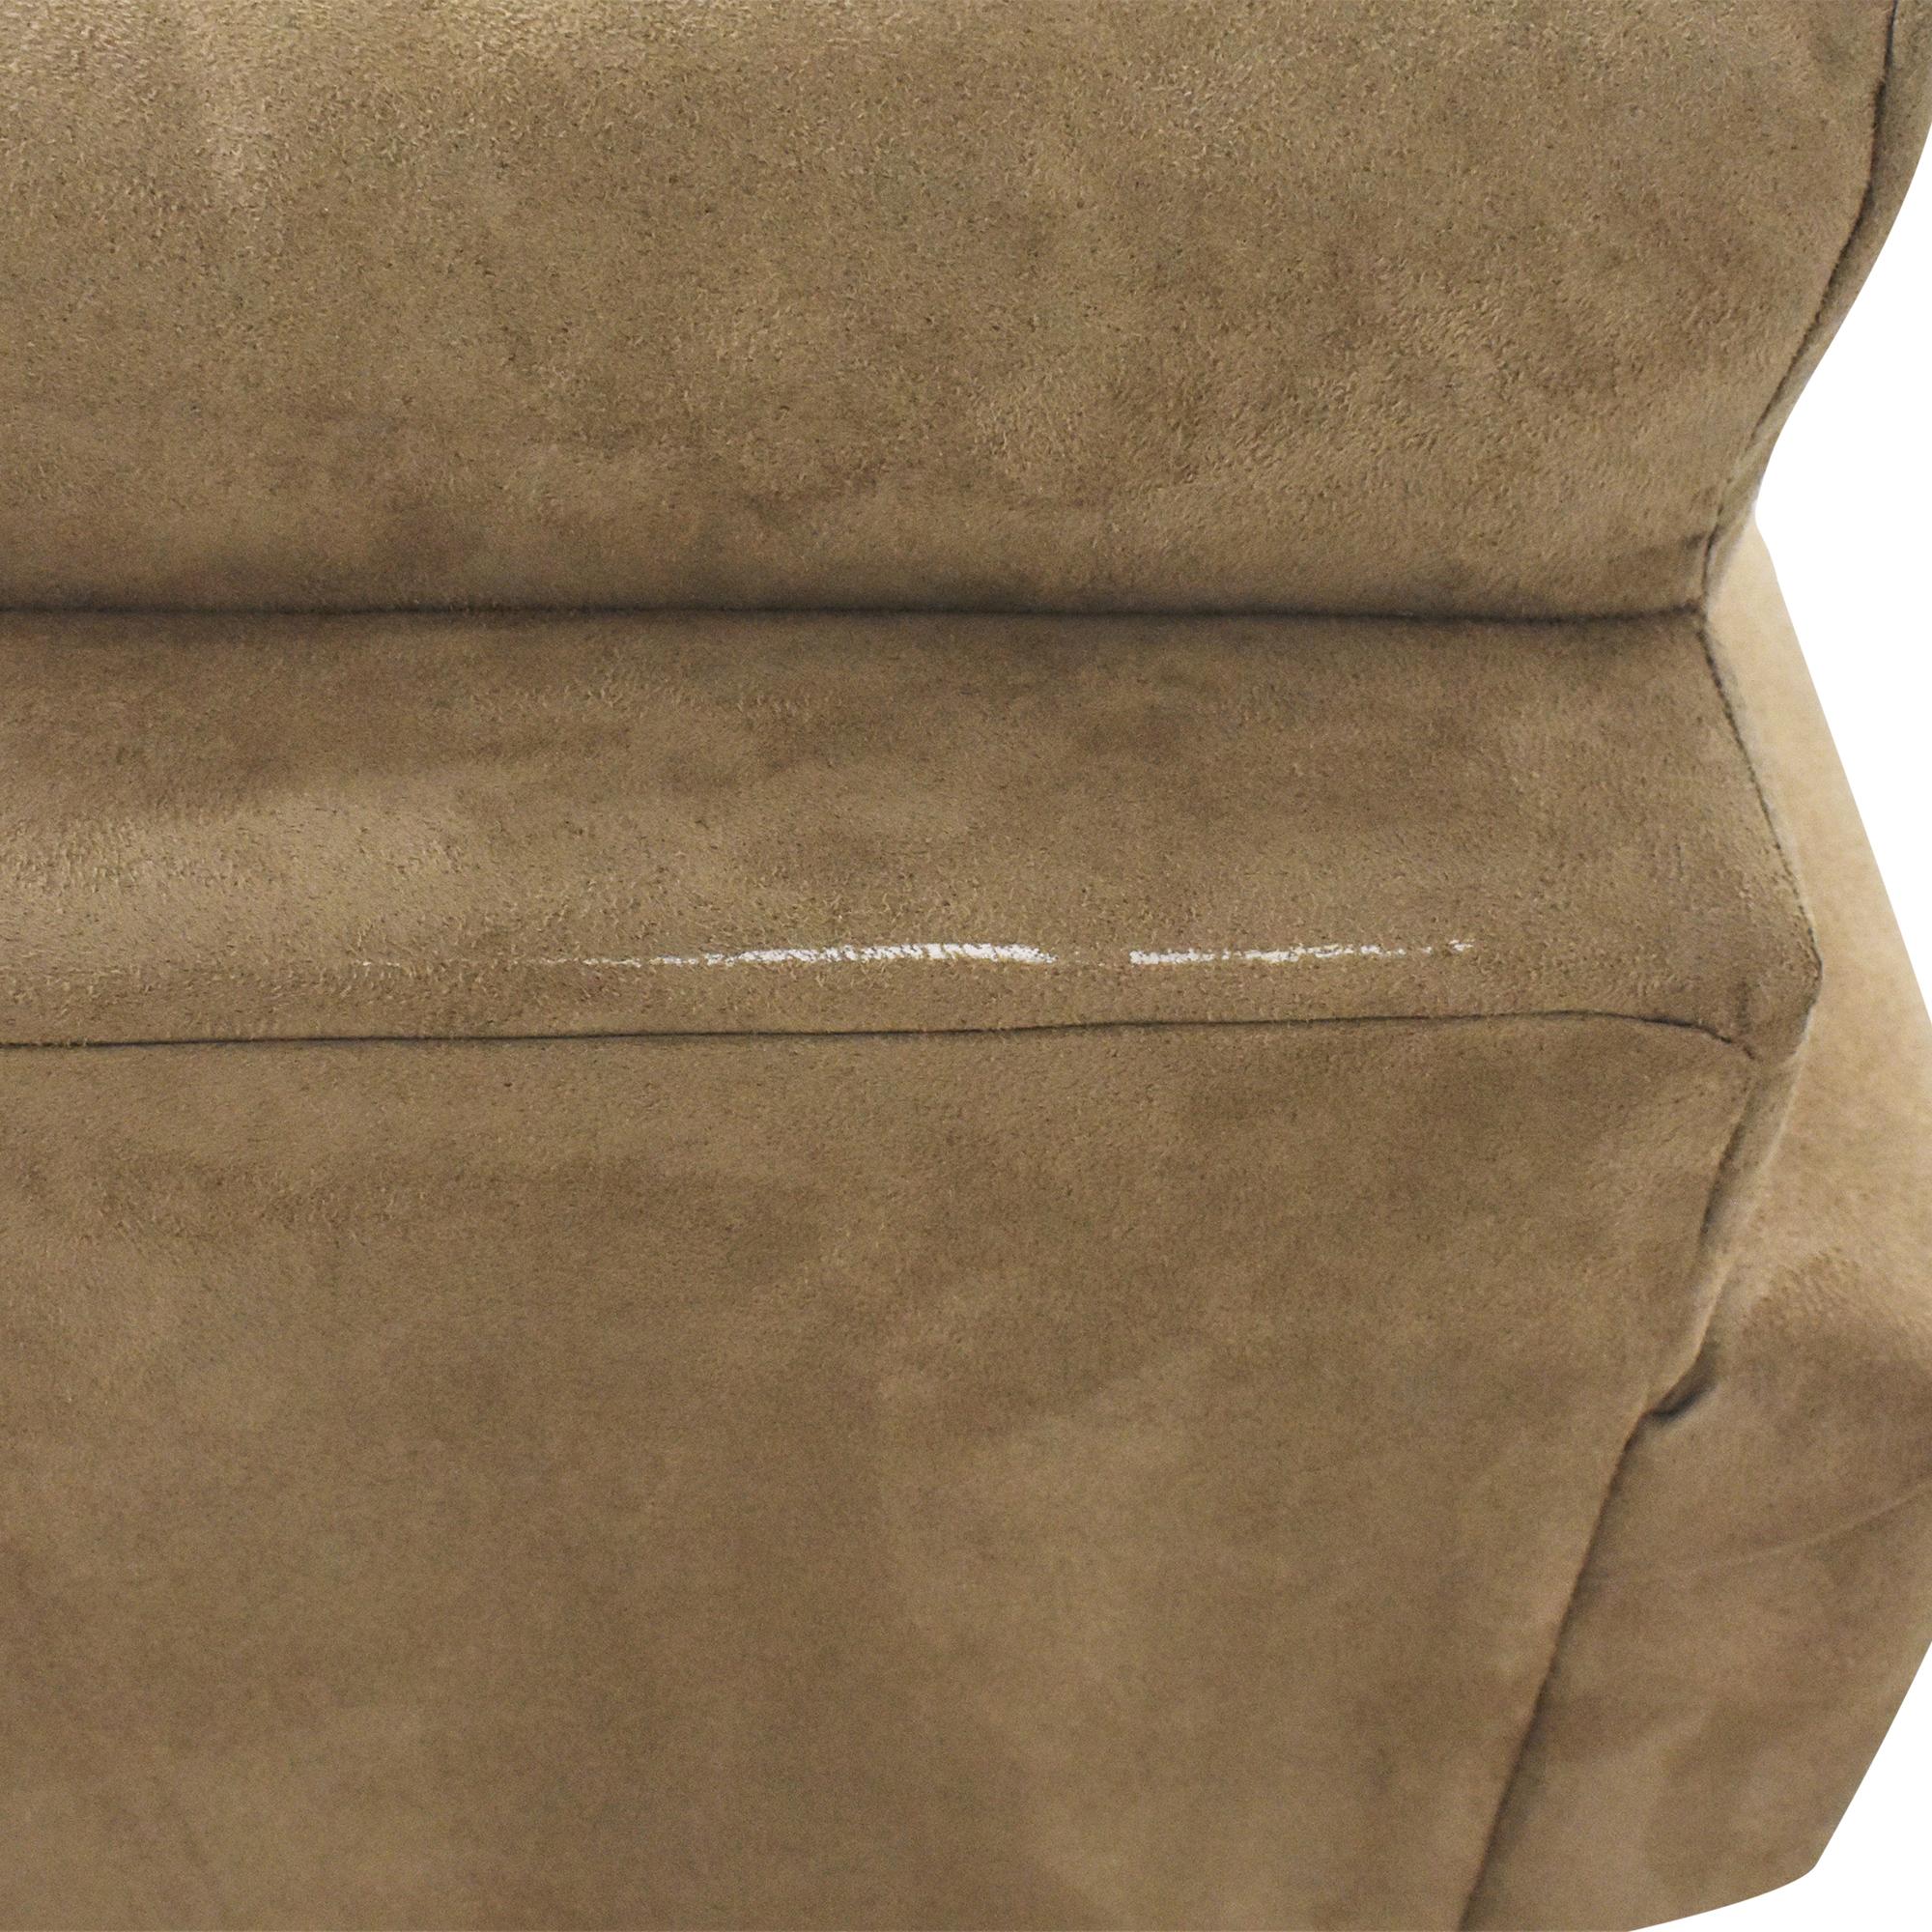 buy LaCrosse Furniture Lacrosse Furniture Two Cushion Sleeper Loveseat online